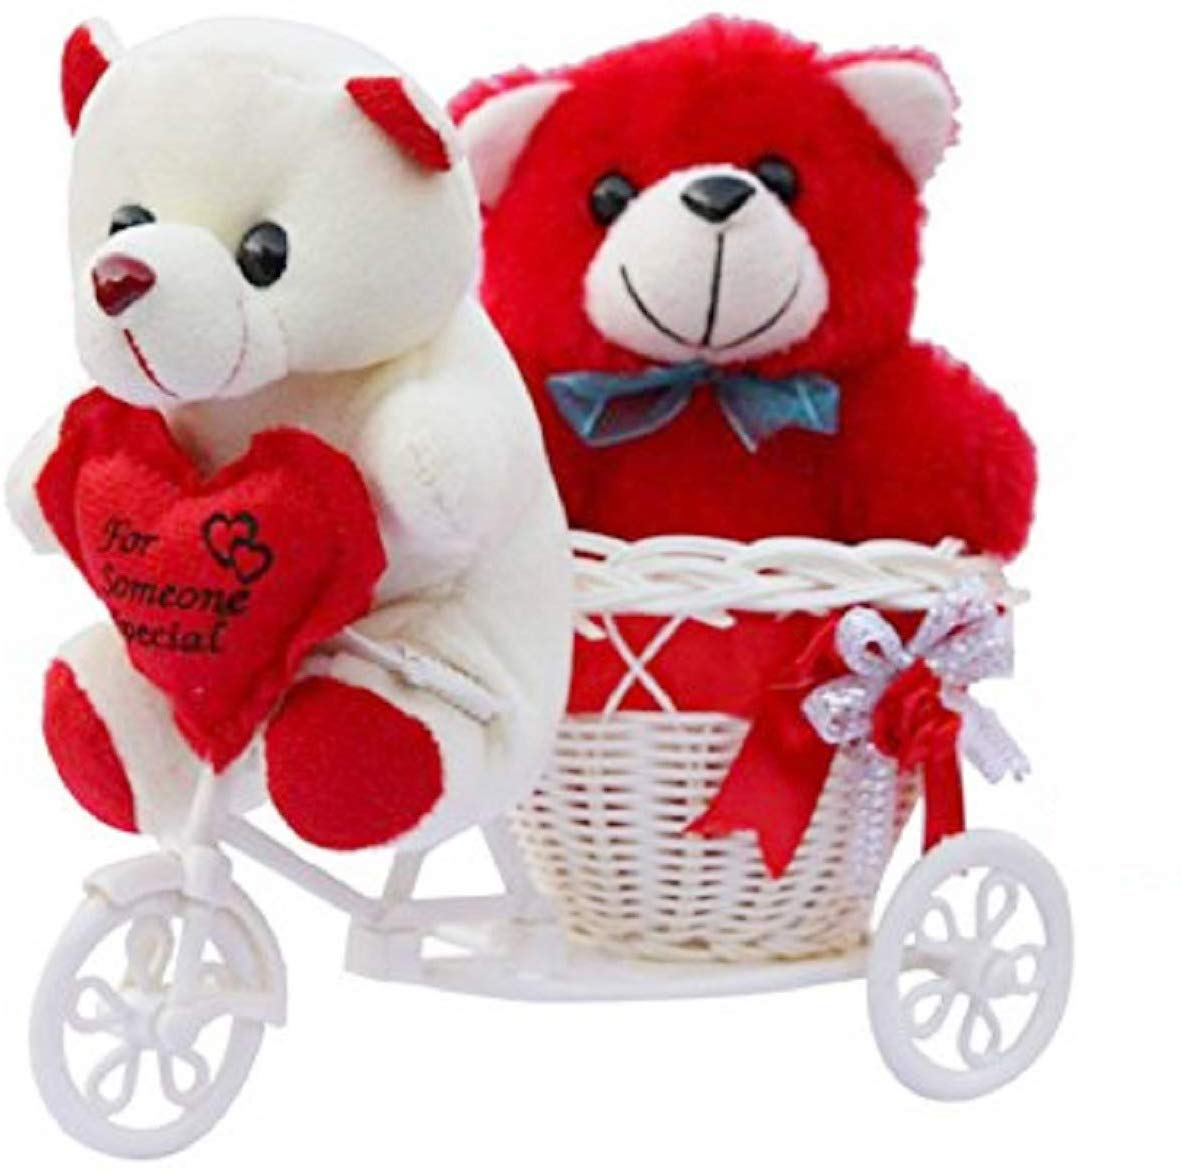 Romantic Gift for Valentine Day Delhi NCR